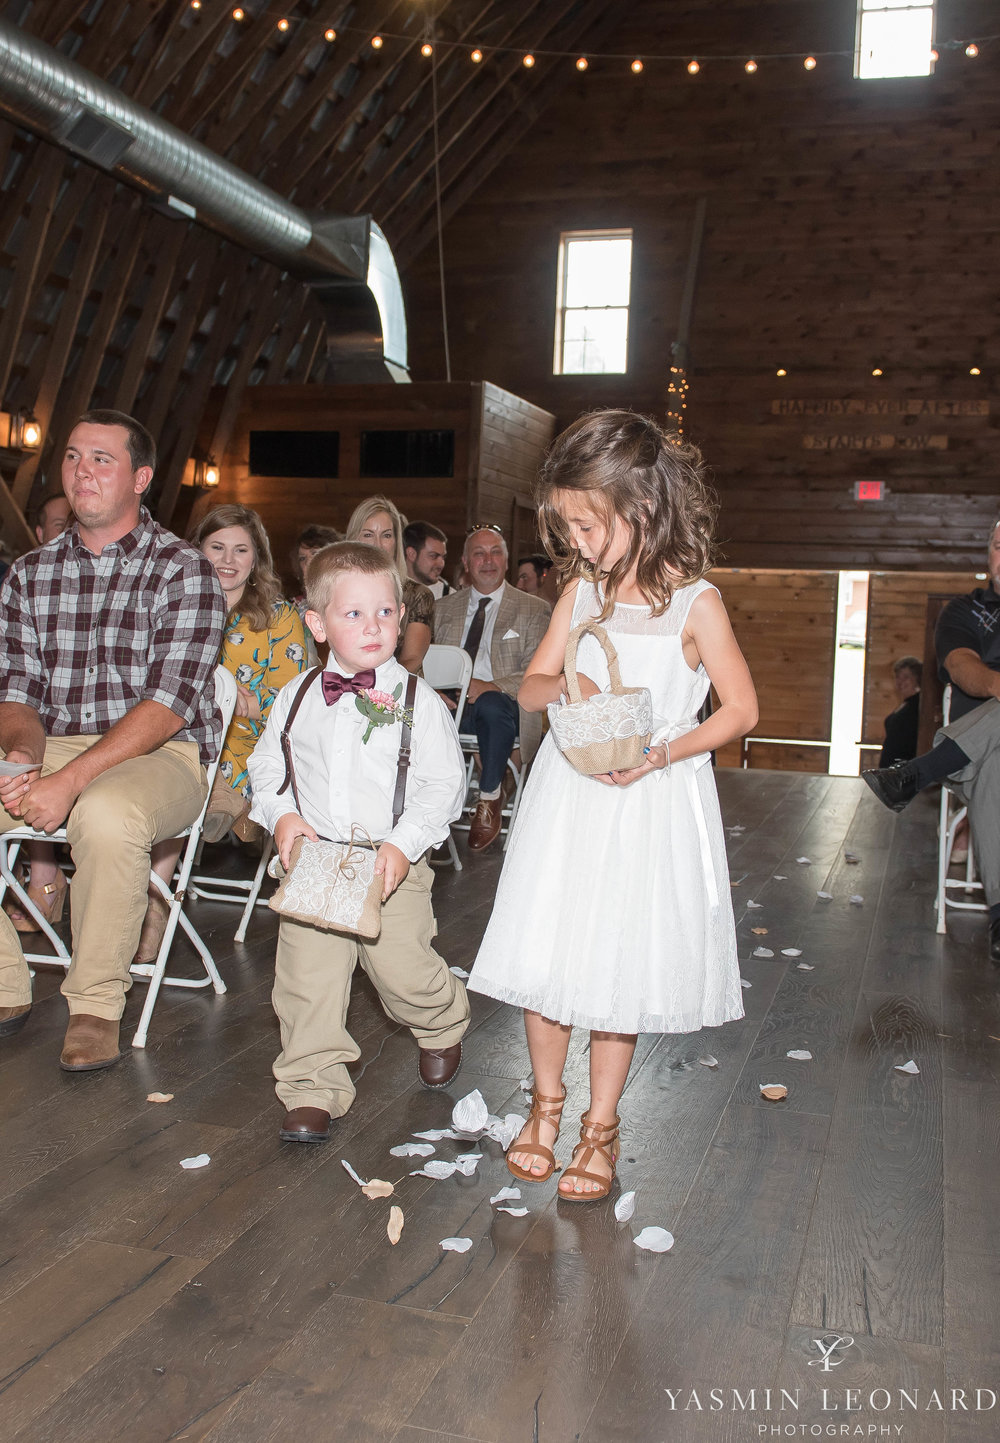 Millikan Farms - NC Wedding Venue - NC Wedding Photographer - Yasmin Leonard Photography - Rain on your wedding day-25.jpg